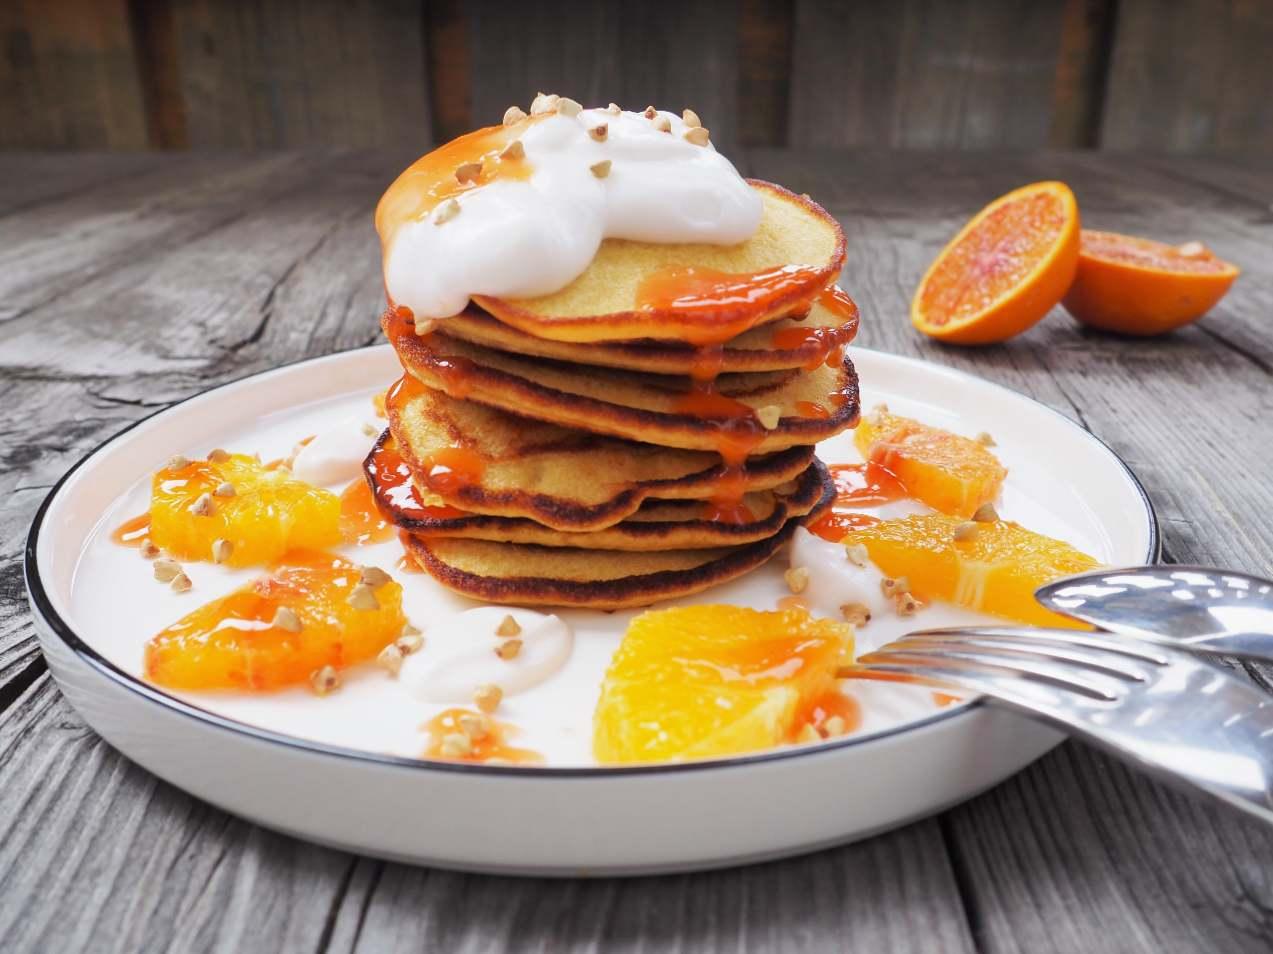 Soulfood! Orangen-Buchweizen-Pancakes mit Kokosjoghurt